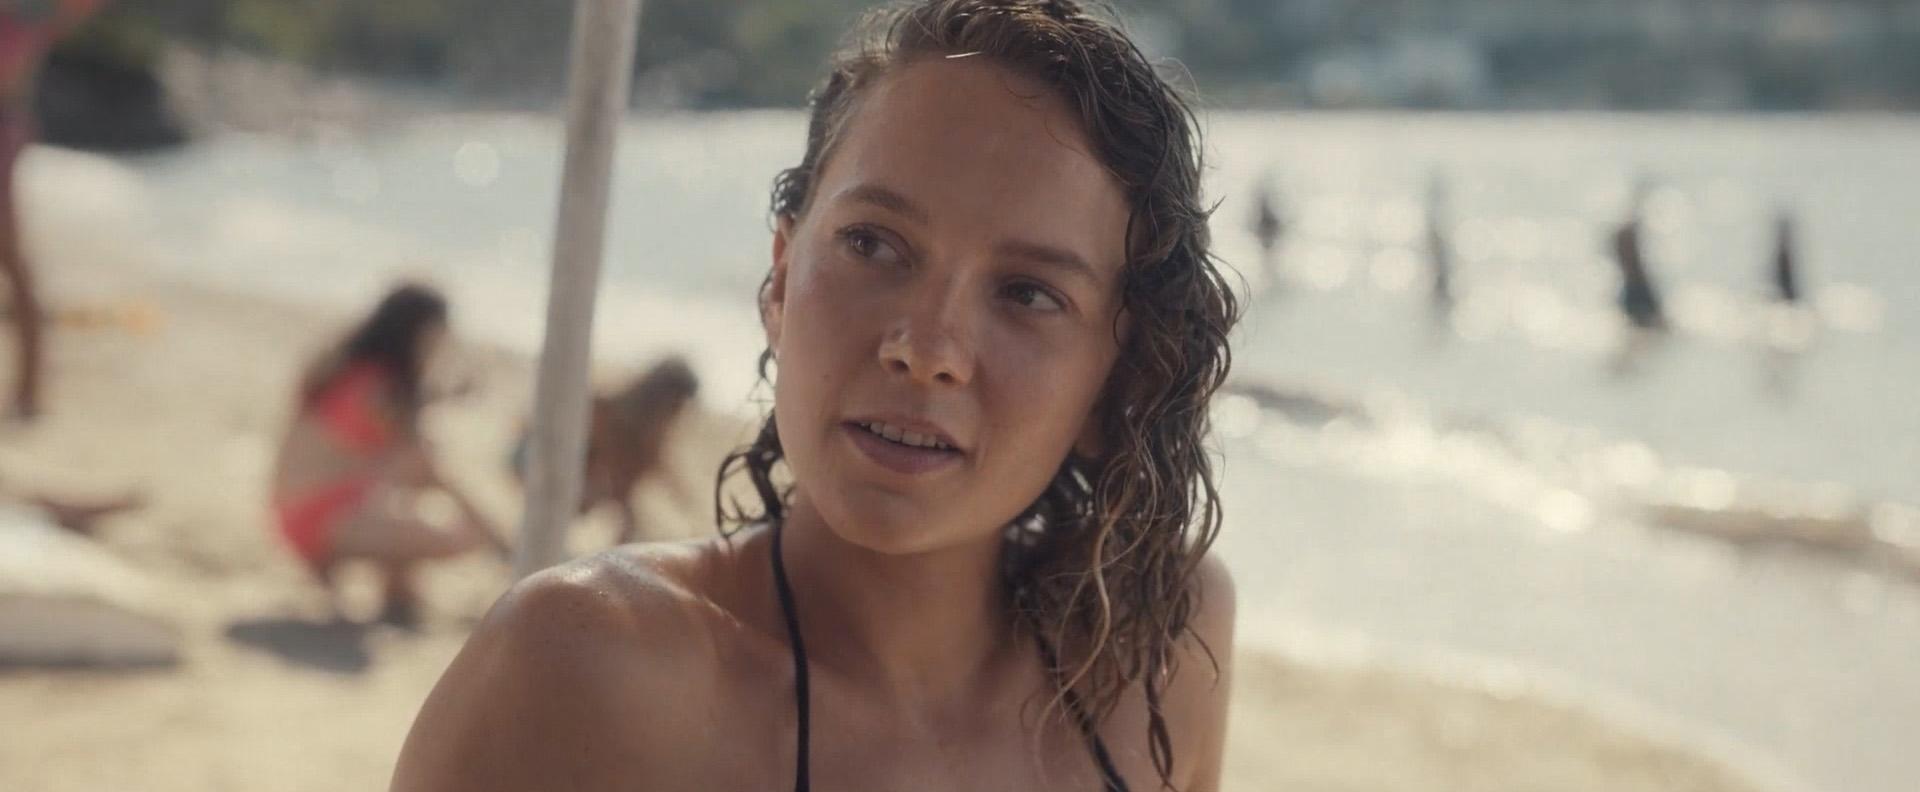 Geçen Yaz   2021   Yerli Film   NF   WEB-DL   XviD   Sansürsüz   720p - 1080p - m720p - m1080p   WEB-DL   Tek Link